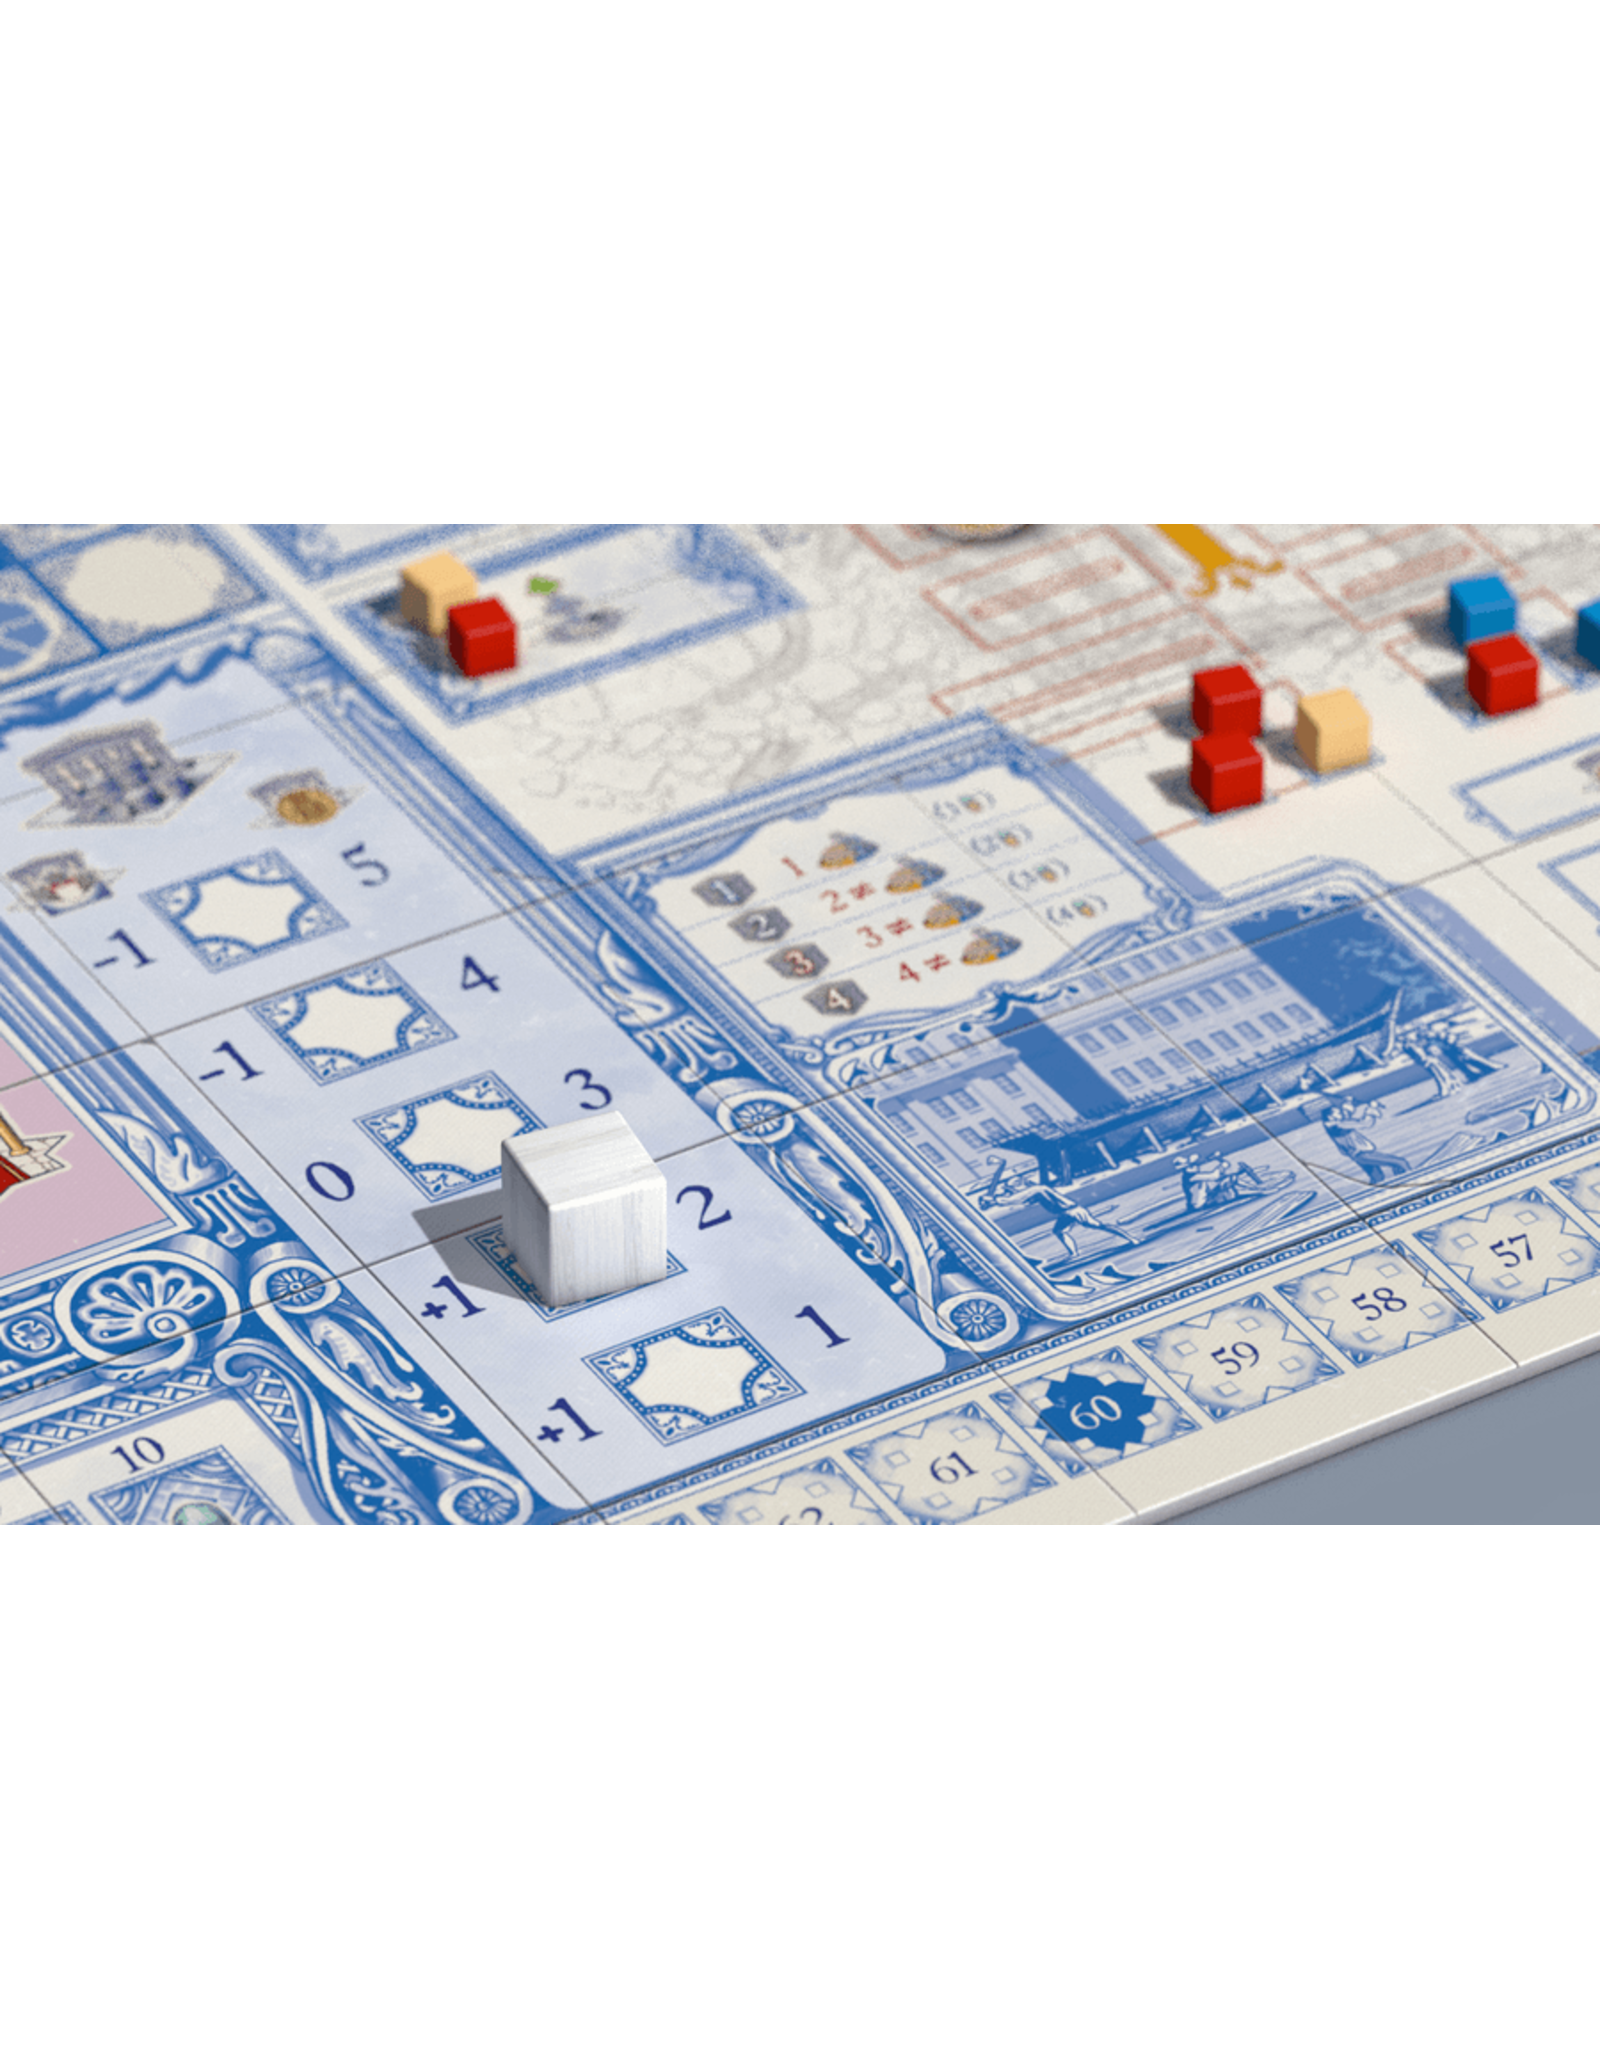 Eagle-Gryphon Games Lisboa: Deluxe Edition